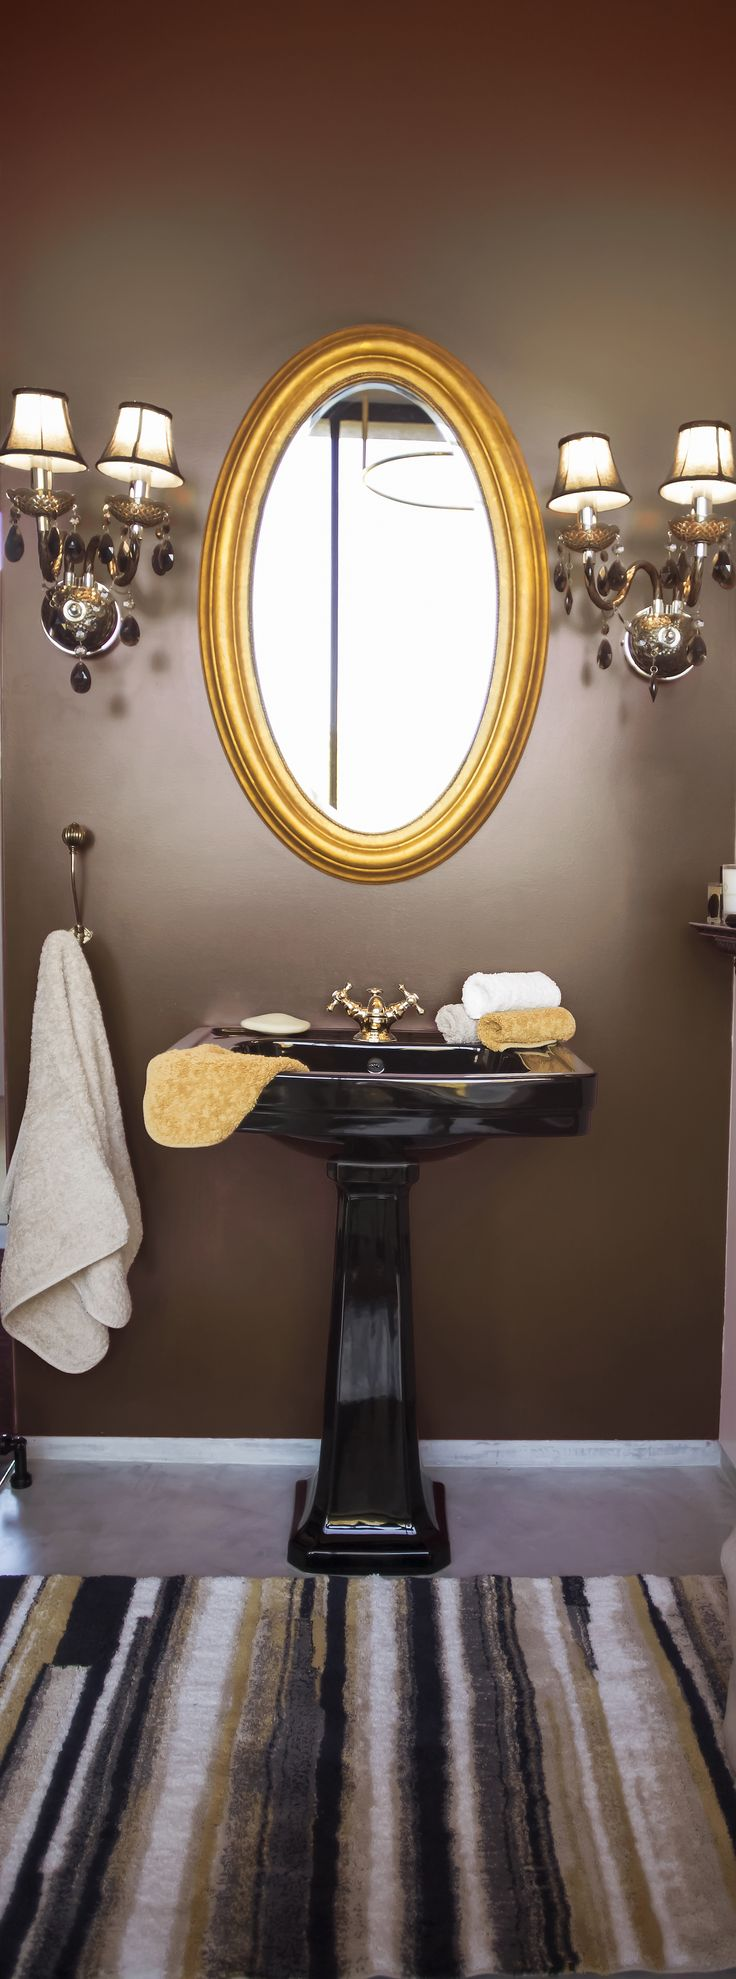 Best Abyss Habidecor Images On Pinterest Luxury Bath - Luxury bath rugs for bathroom decorating ideas